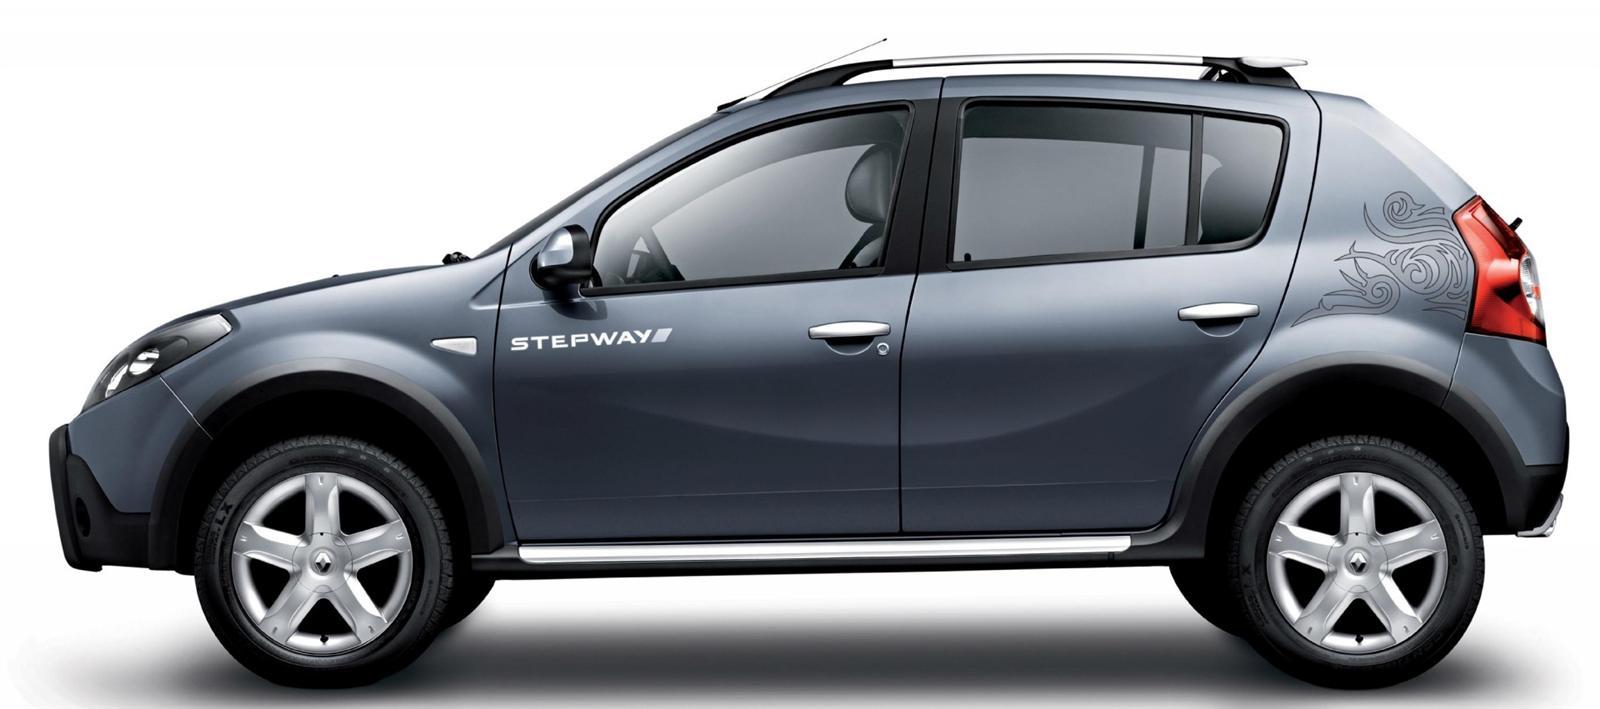 2008 Renault Sandero Stepway